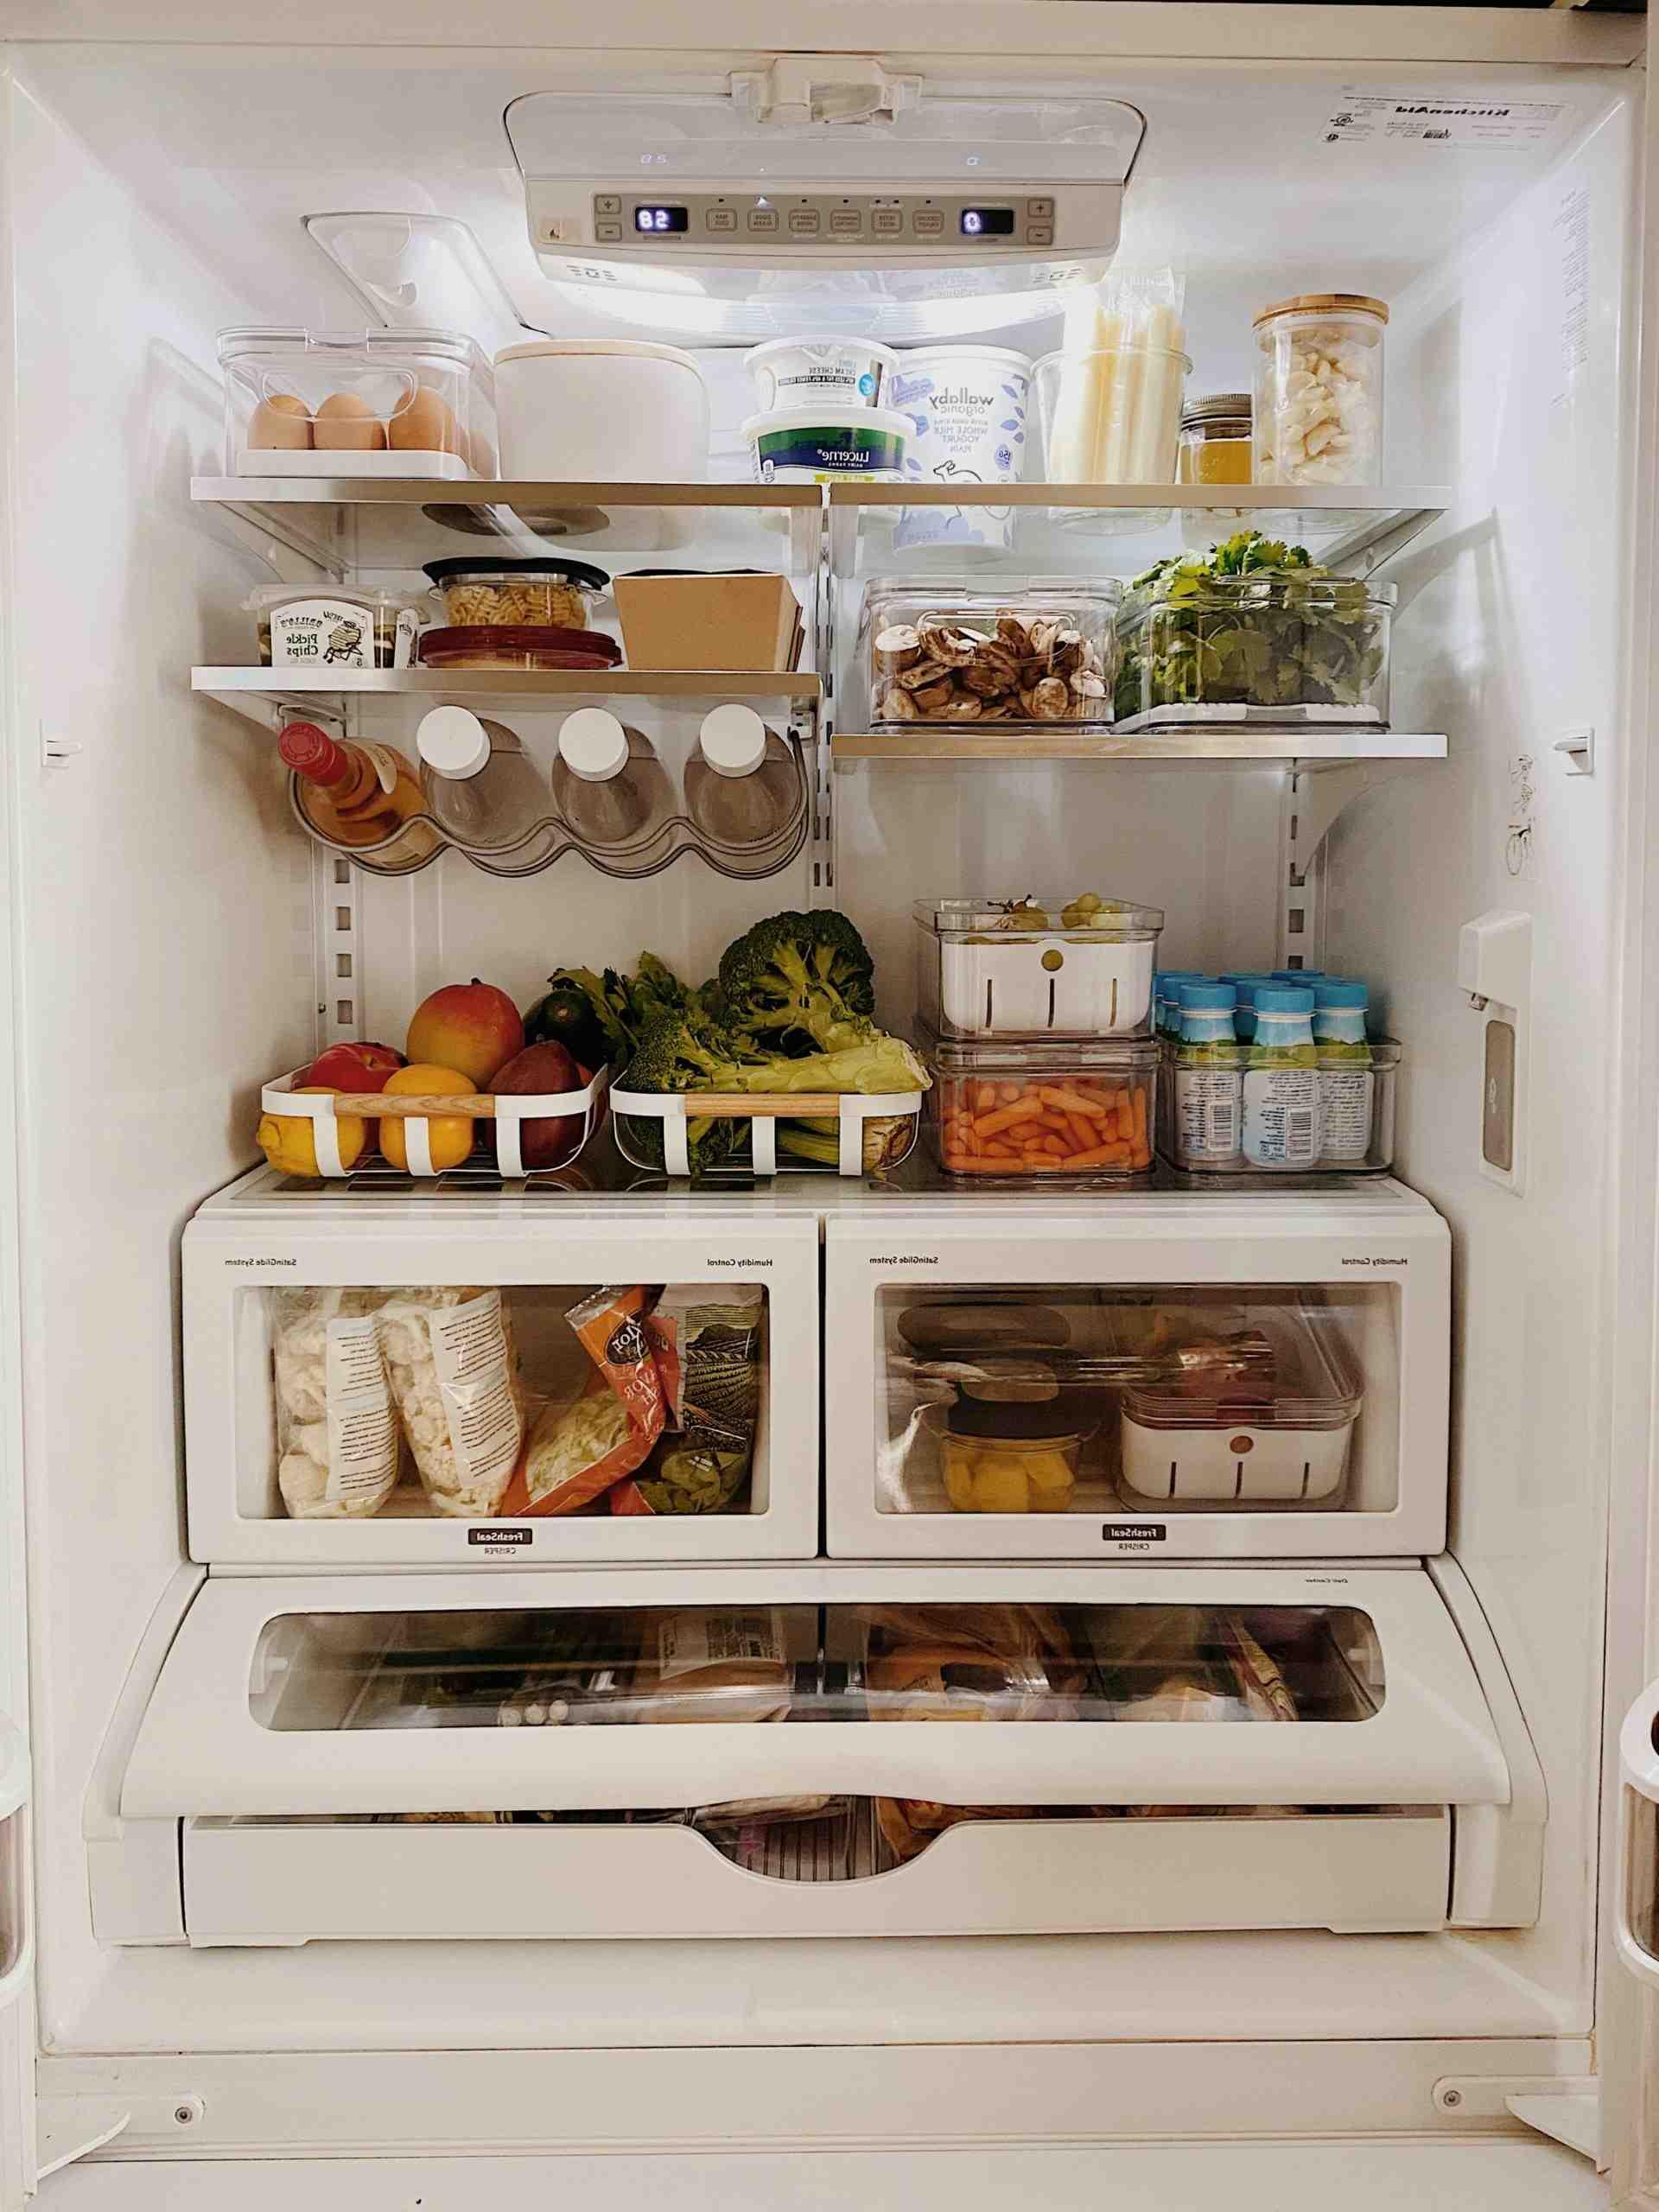 Comment ranger son frigo Marie Kondo ?